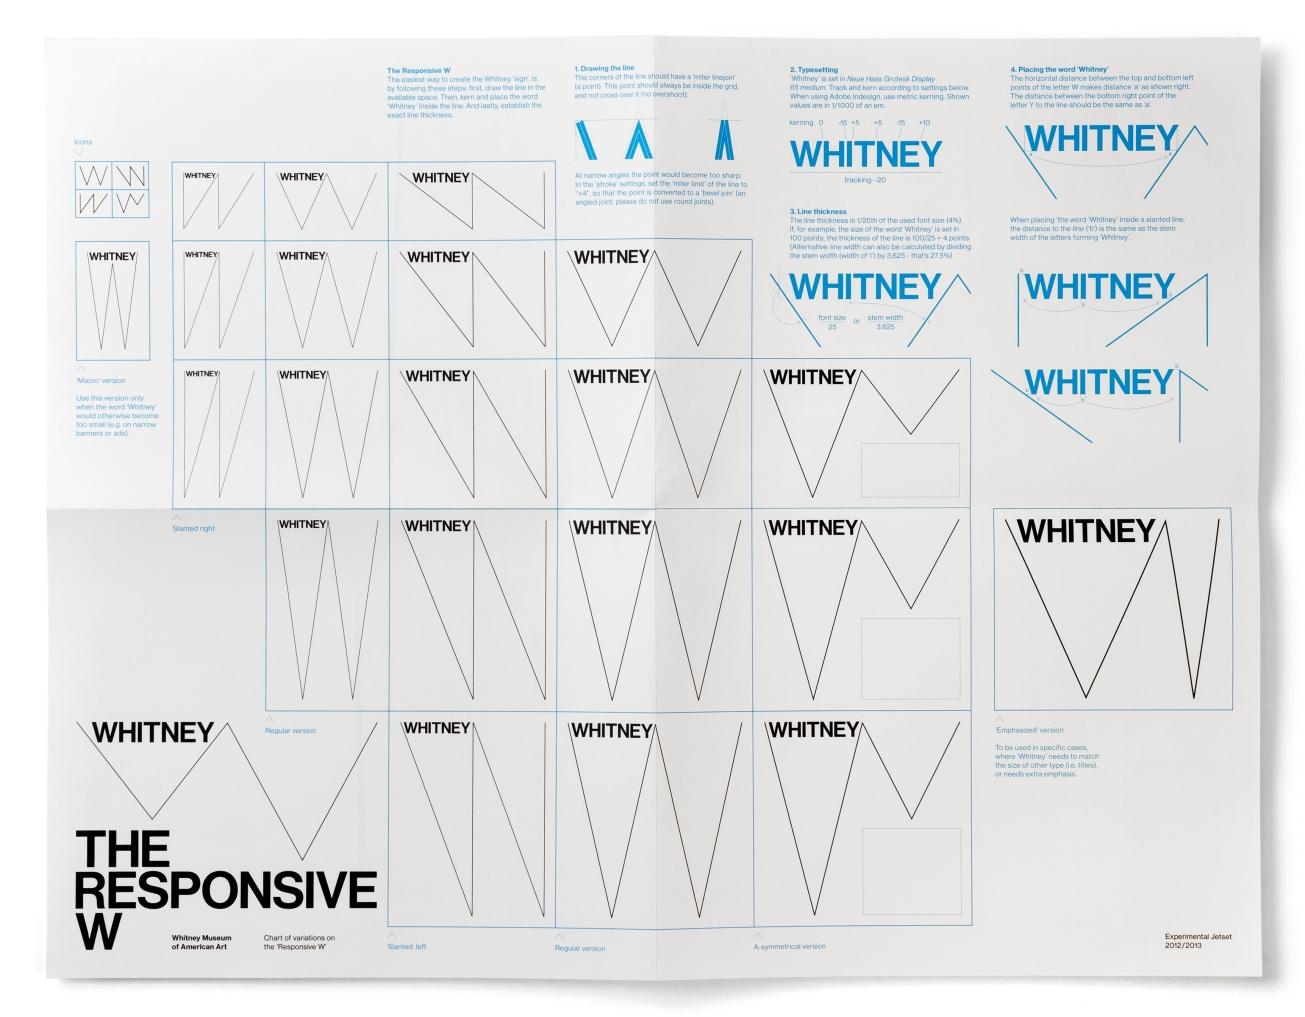 Whitney-EXJ-chart.jpg